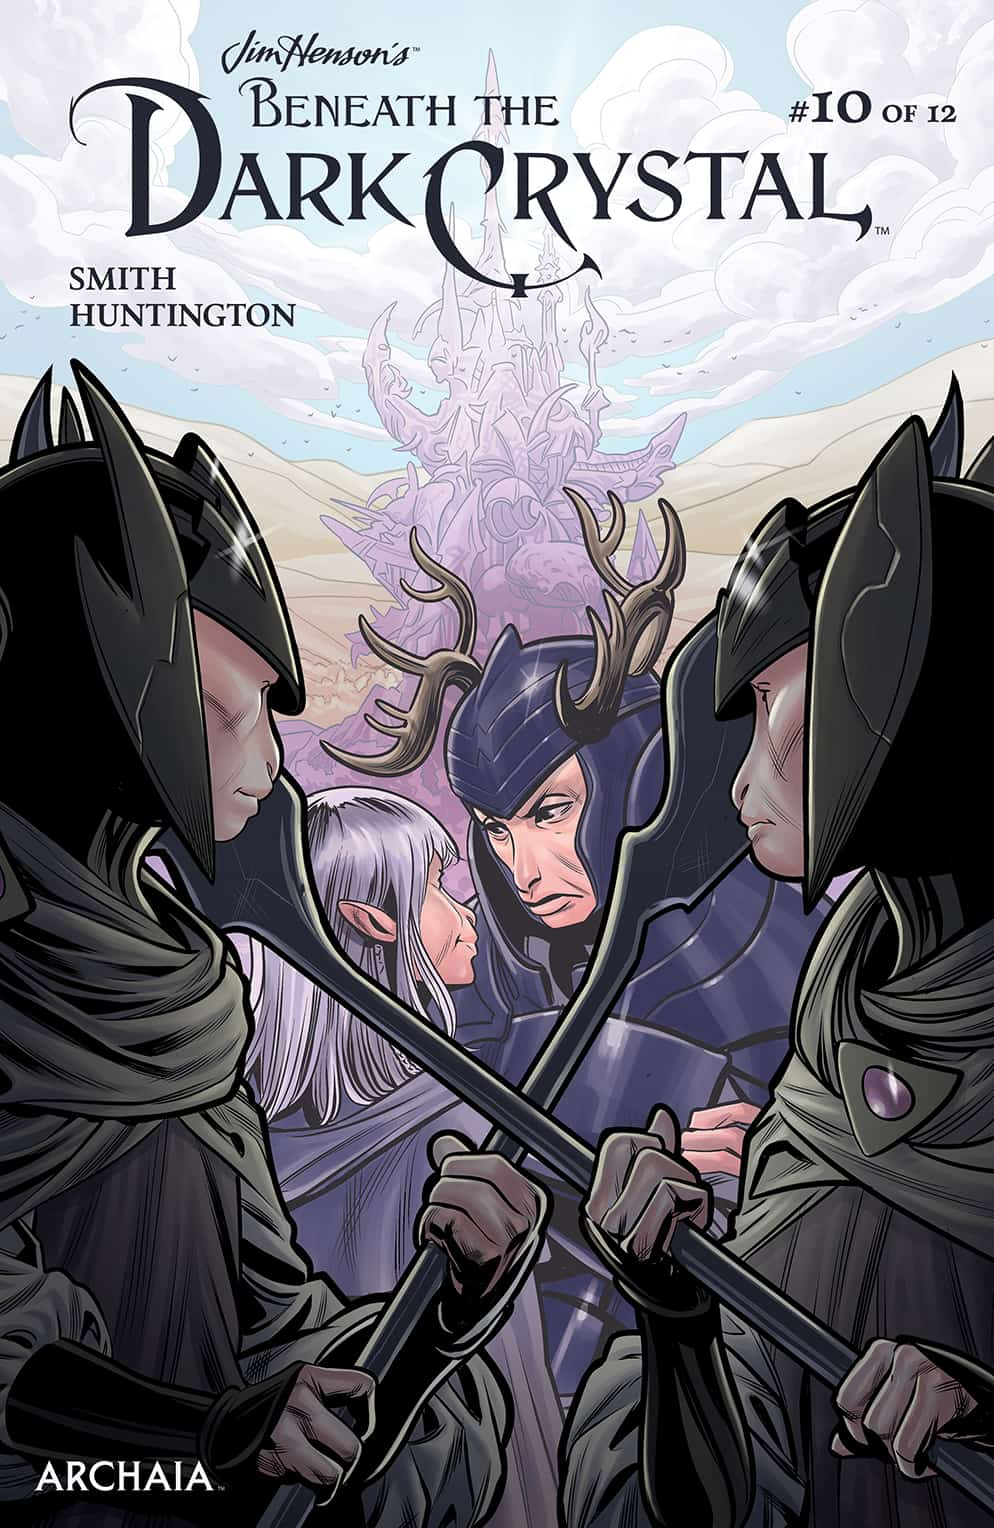 Beneath the Dark Crystal #10